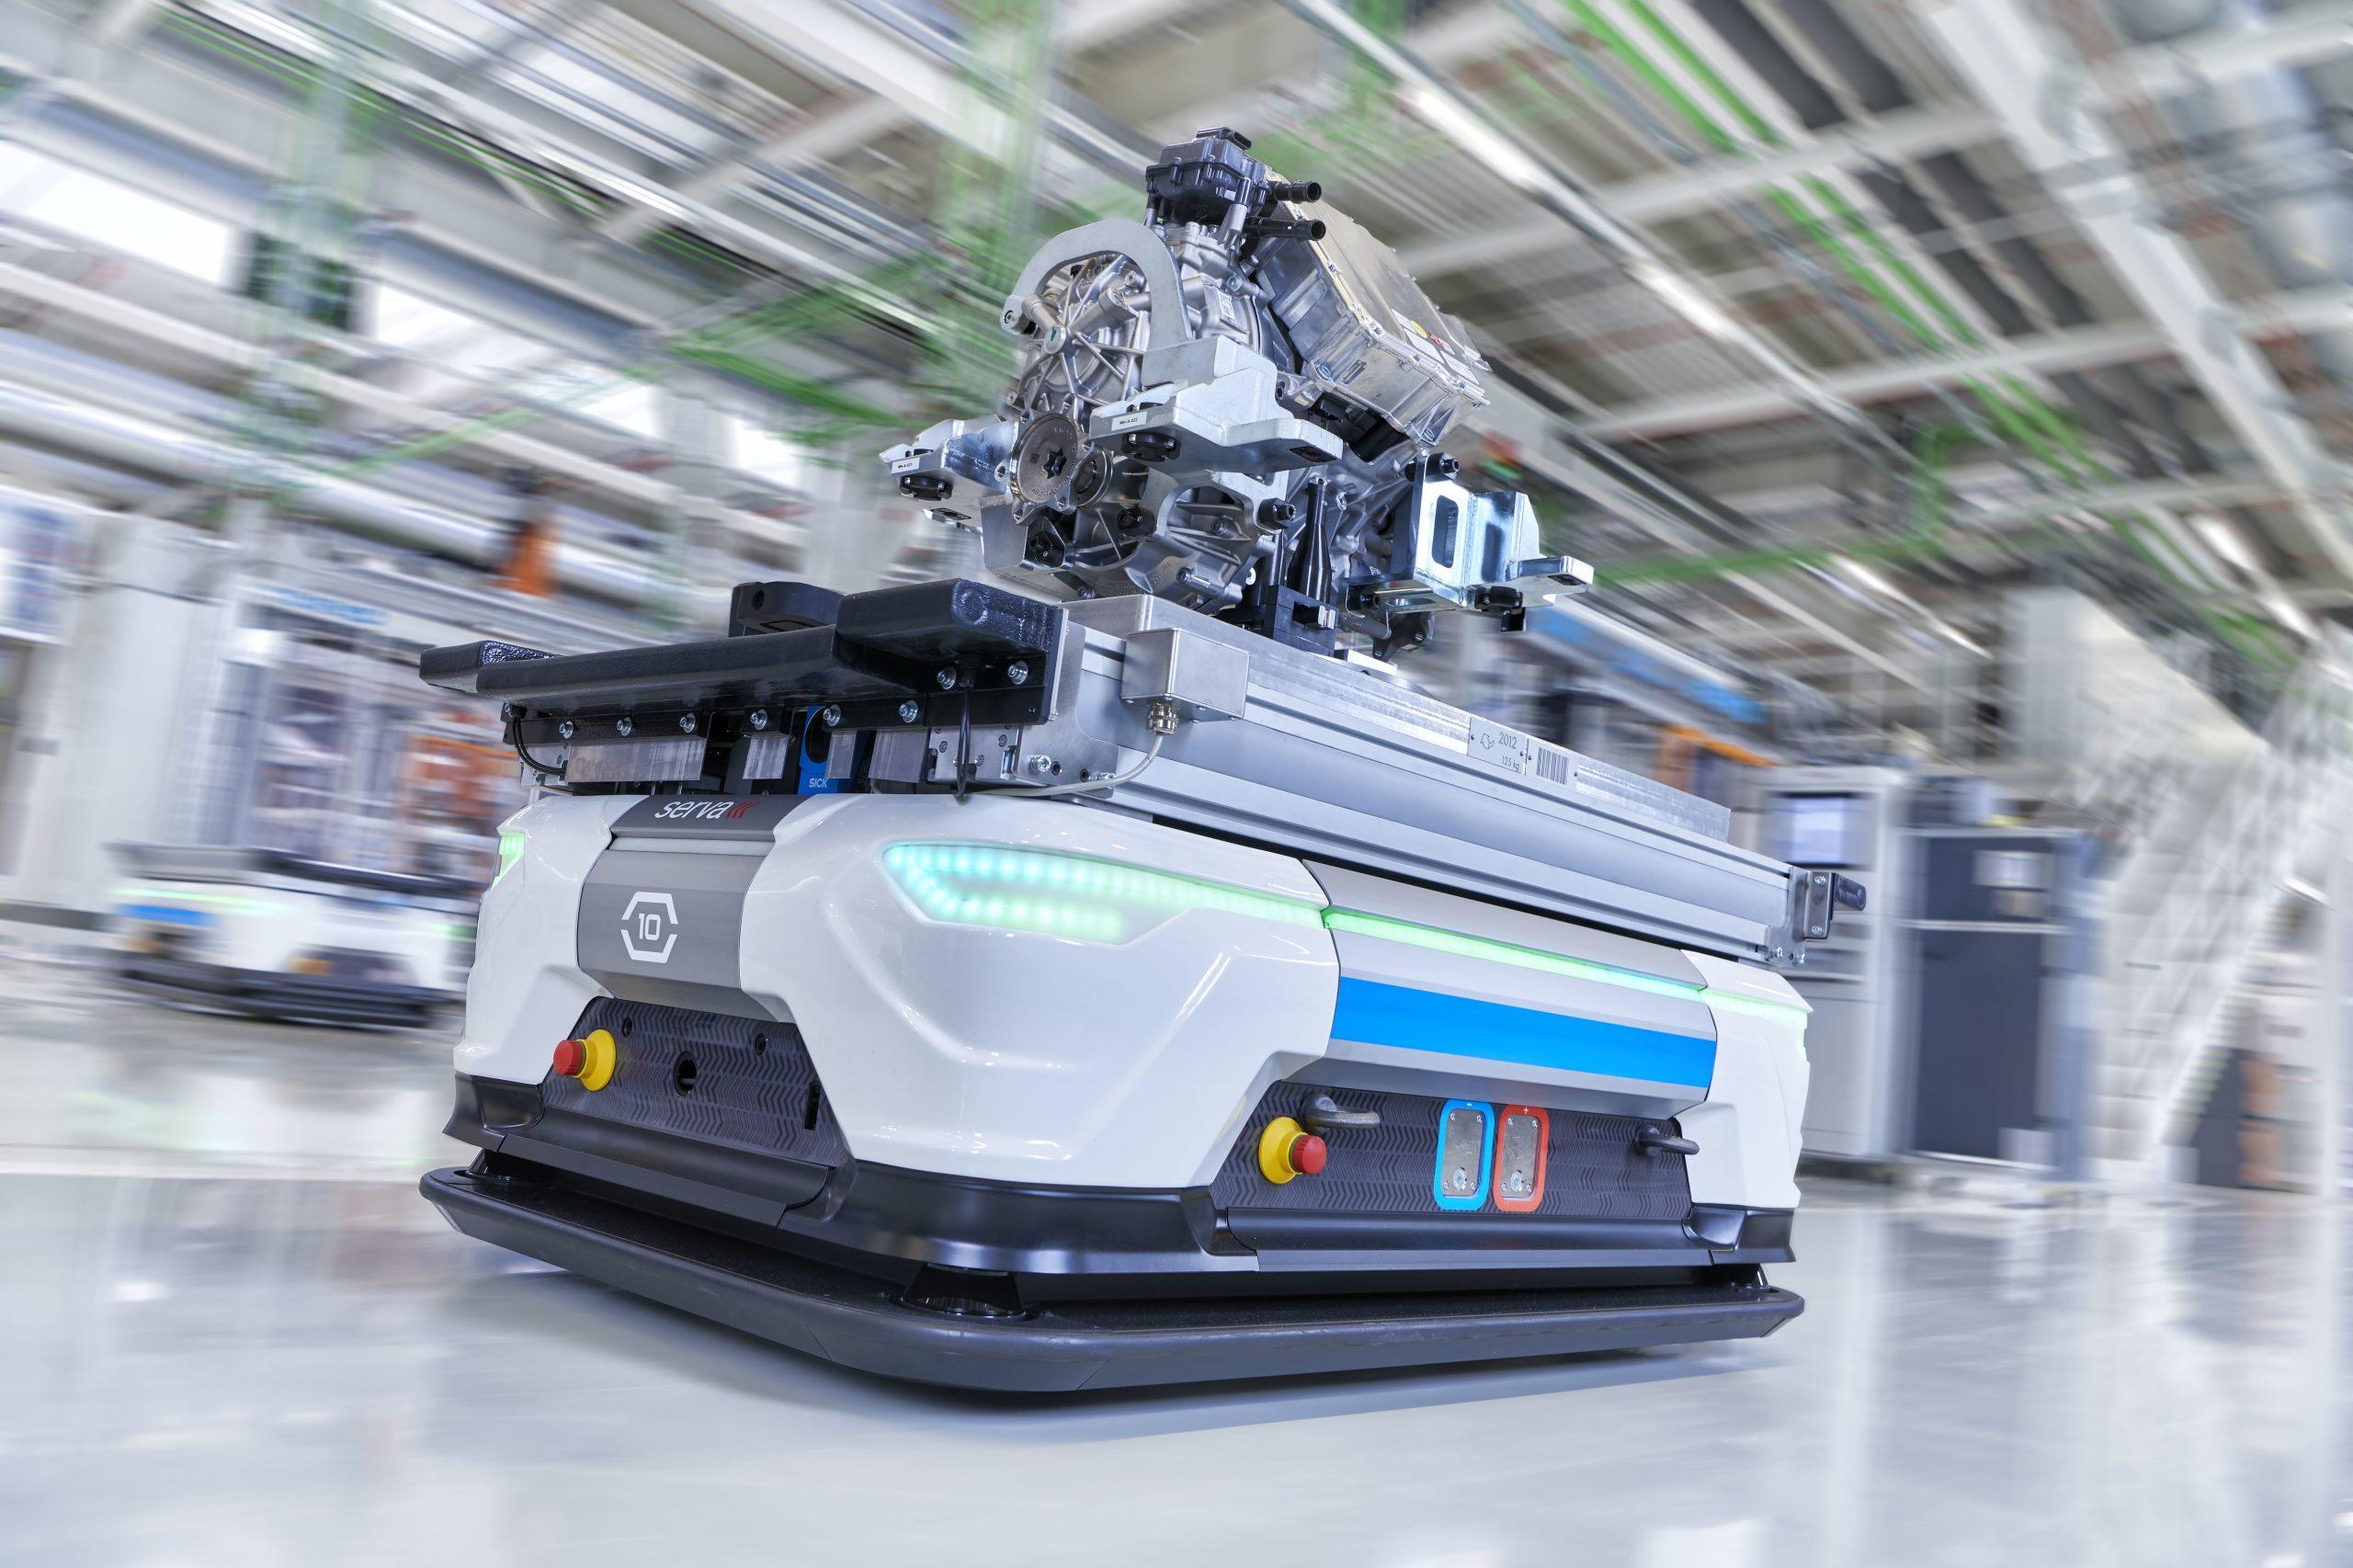 Fahrerloses Transportfahrzeug mit fertigem Elektromotor (Bild: Audi AG)